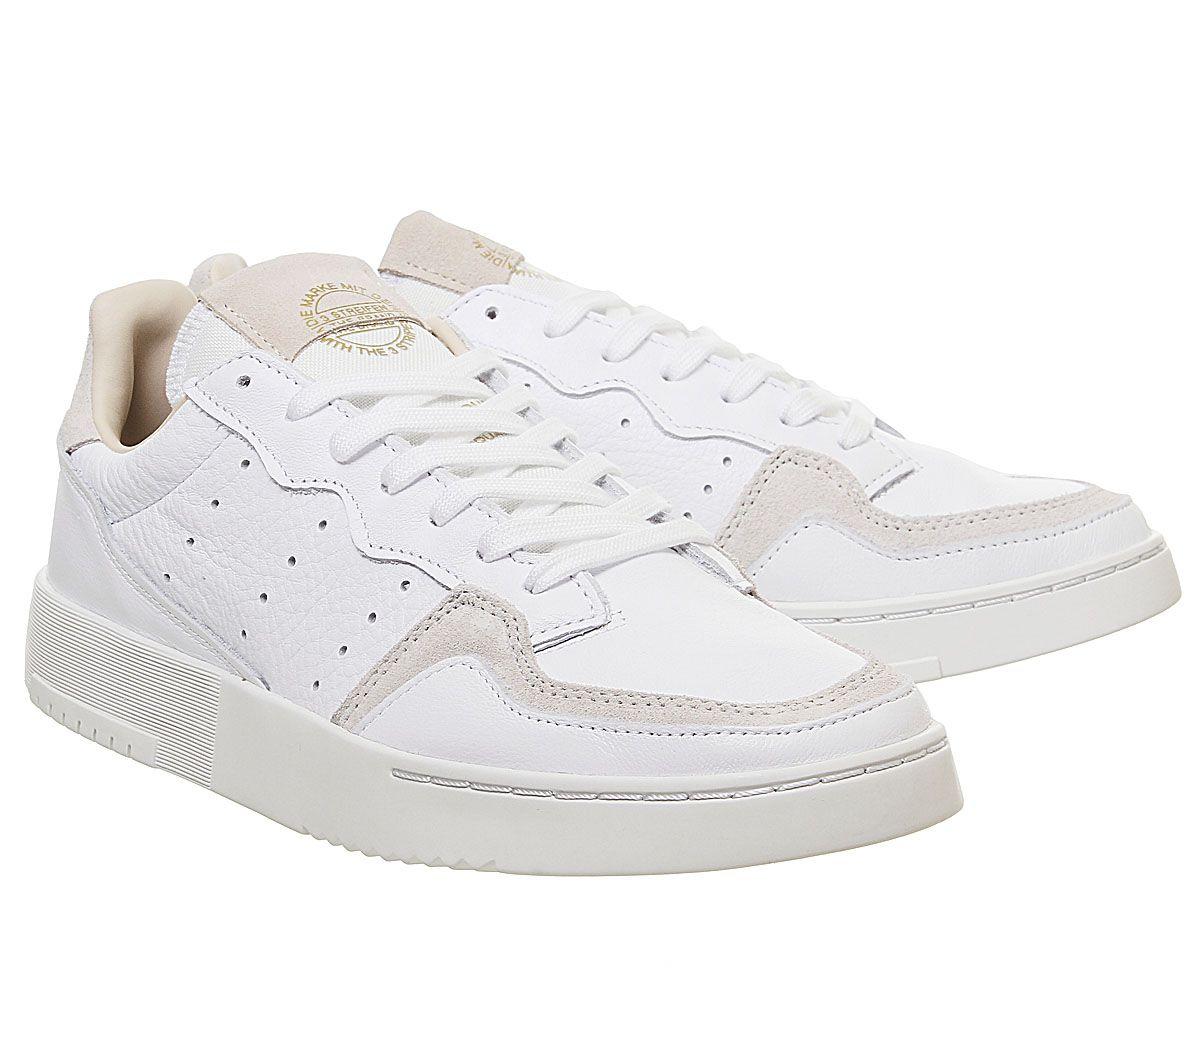 Adidas-Supercourt-Baskets-Blanc-Cristal-Blanc-Baskets-Chaussures miniature 7